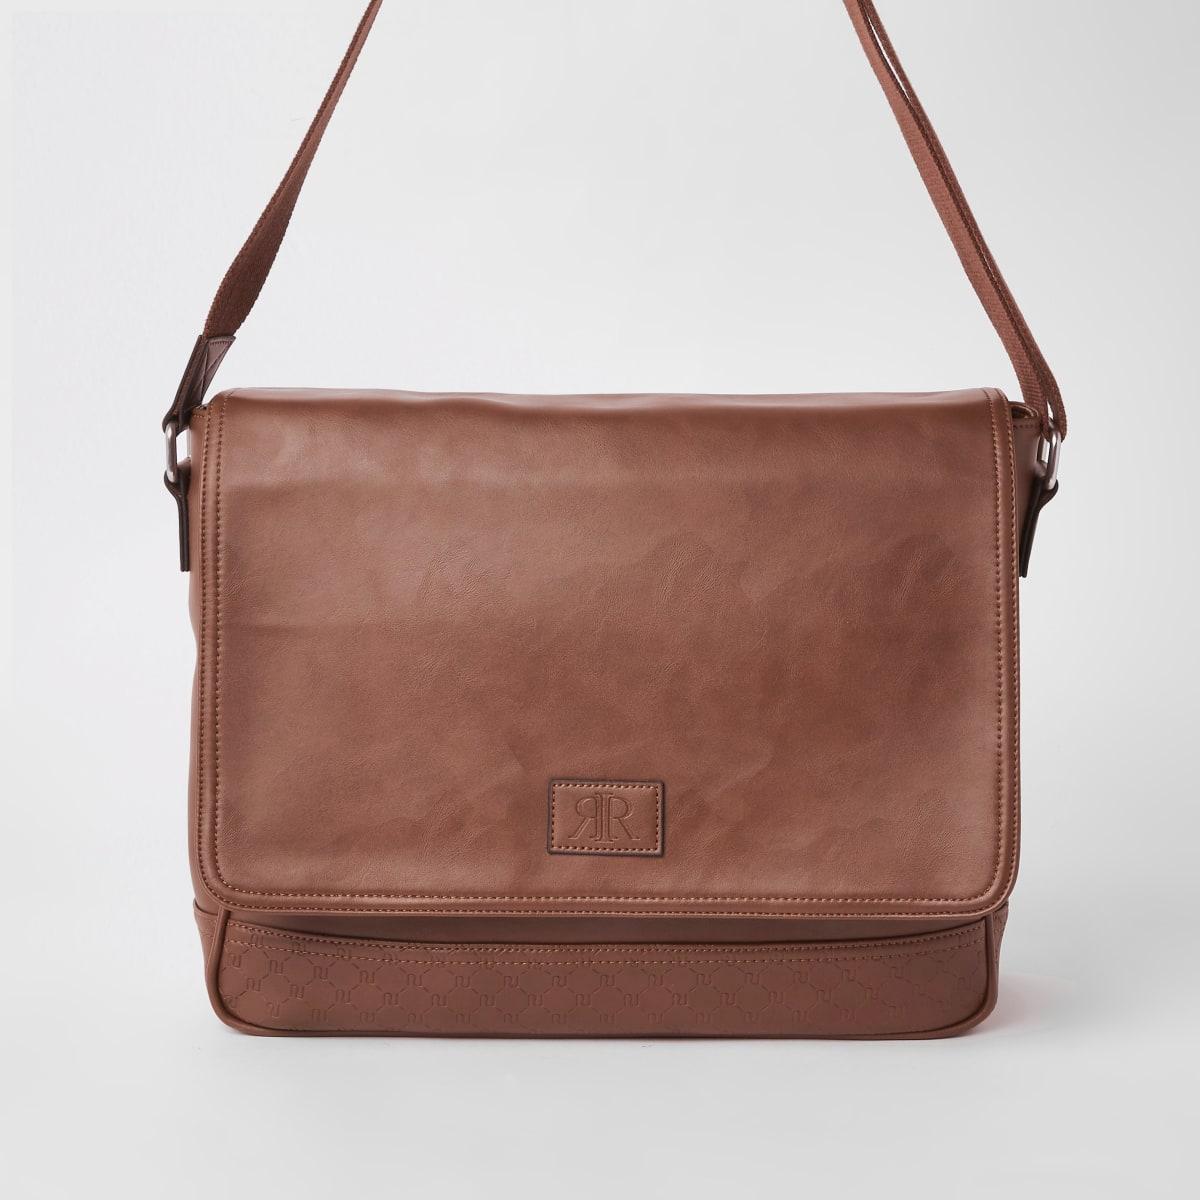 Sacoche marron avec rabat à monogramme RI